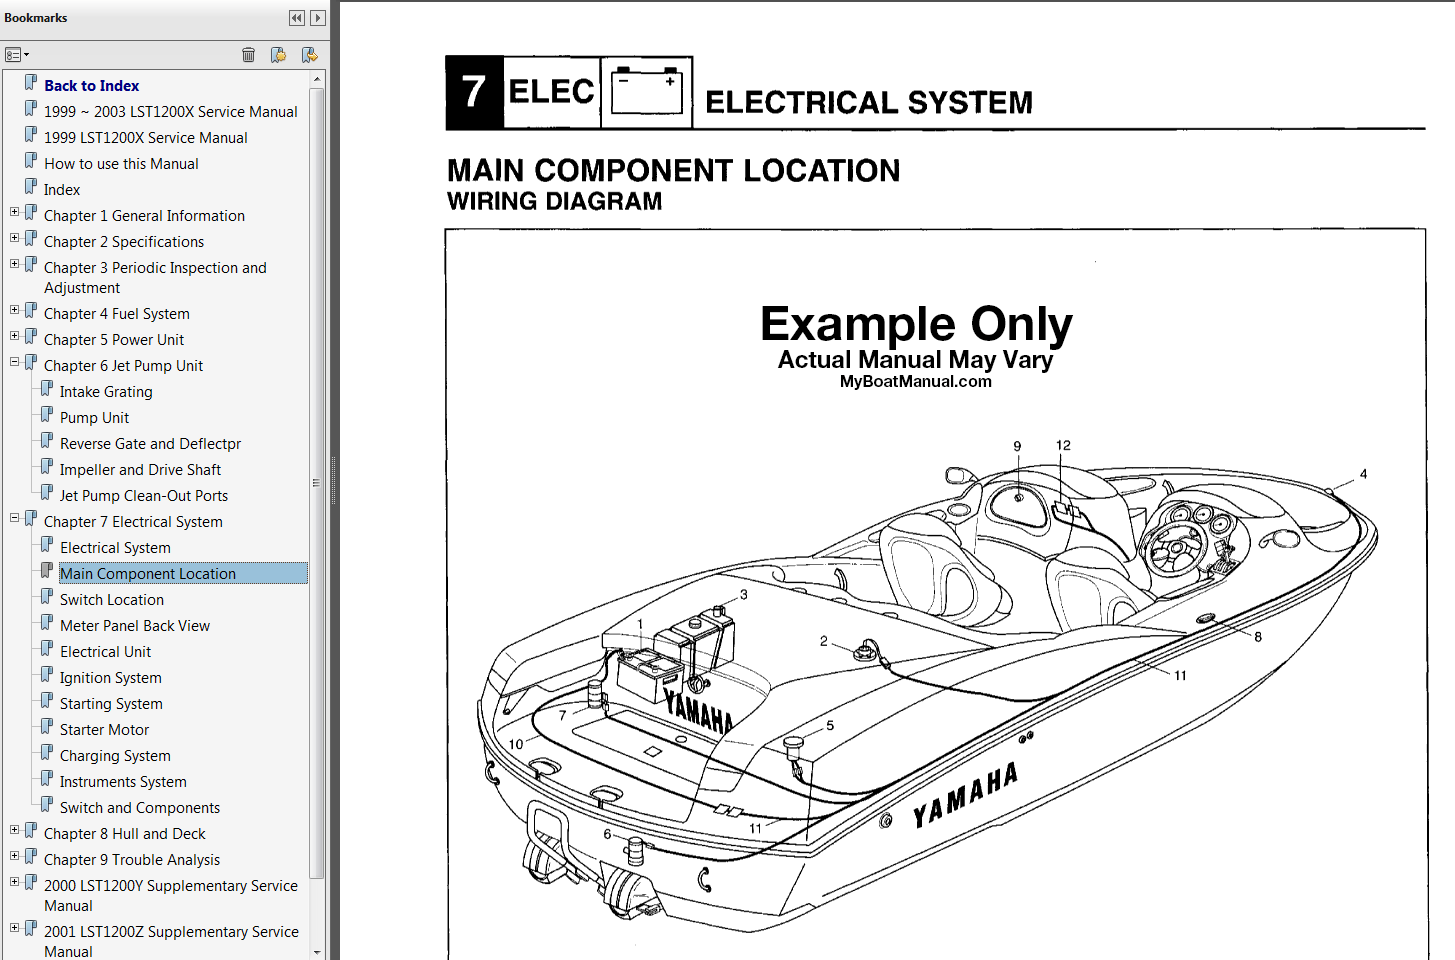 Yamaha Xj 550 Wiring Diagram